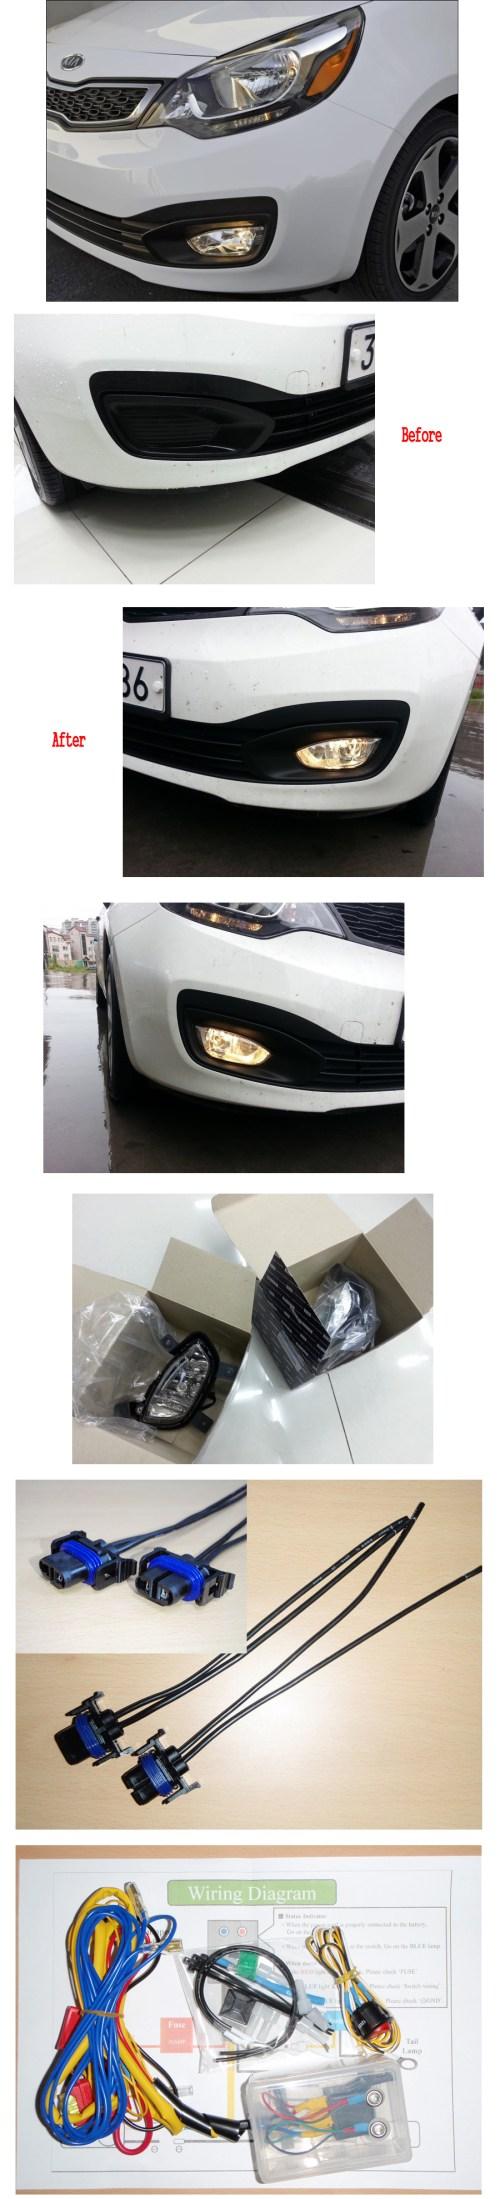 small resolution of fog lamp light harness complete kit for 12 2015 kia rio sedan 4door rh ebay com